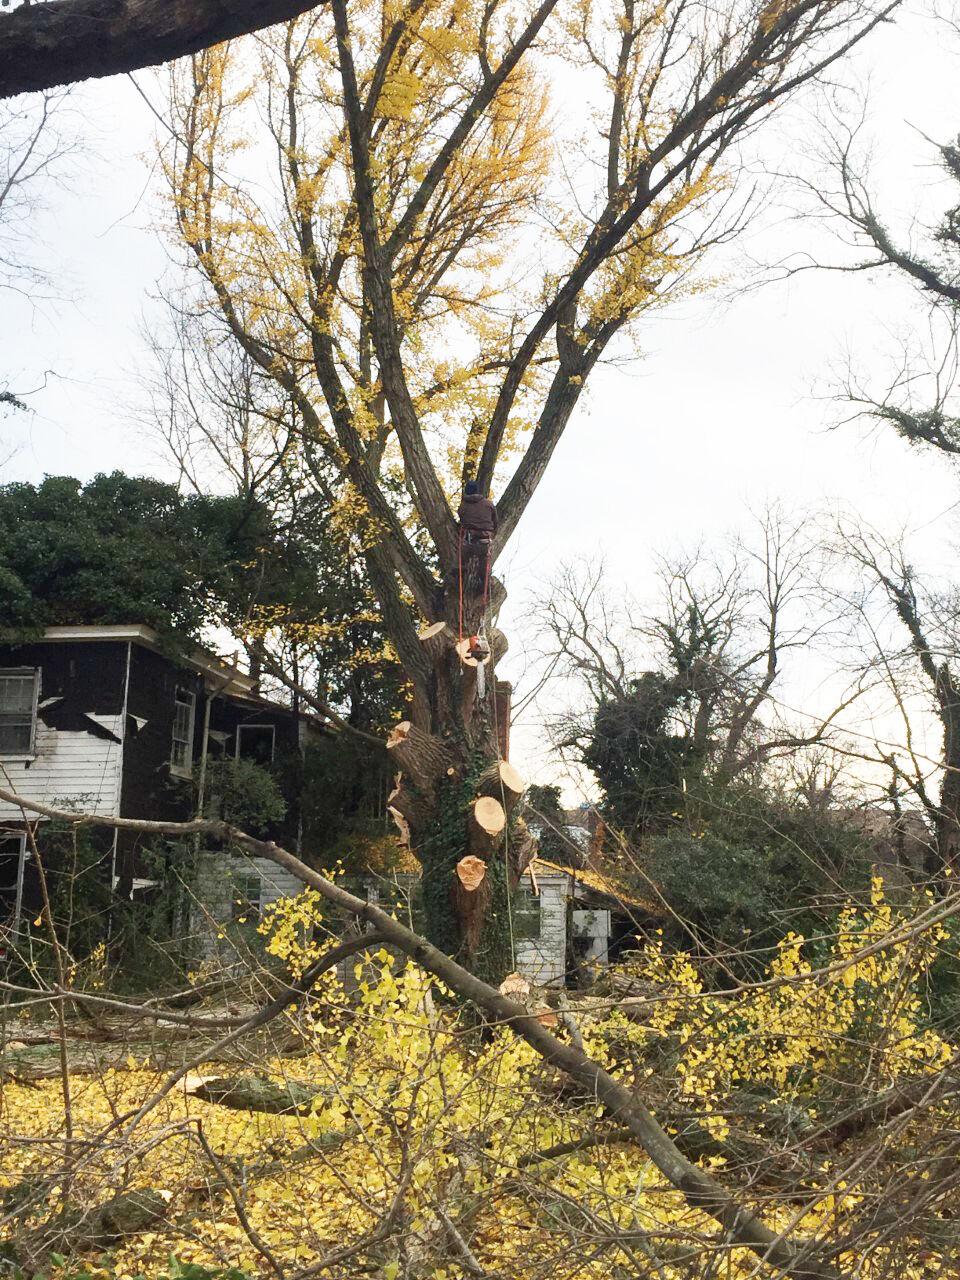 photo_ft_news_gingko tree down 3_120920 copy.jpg